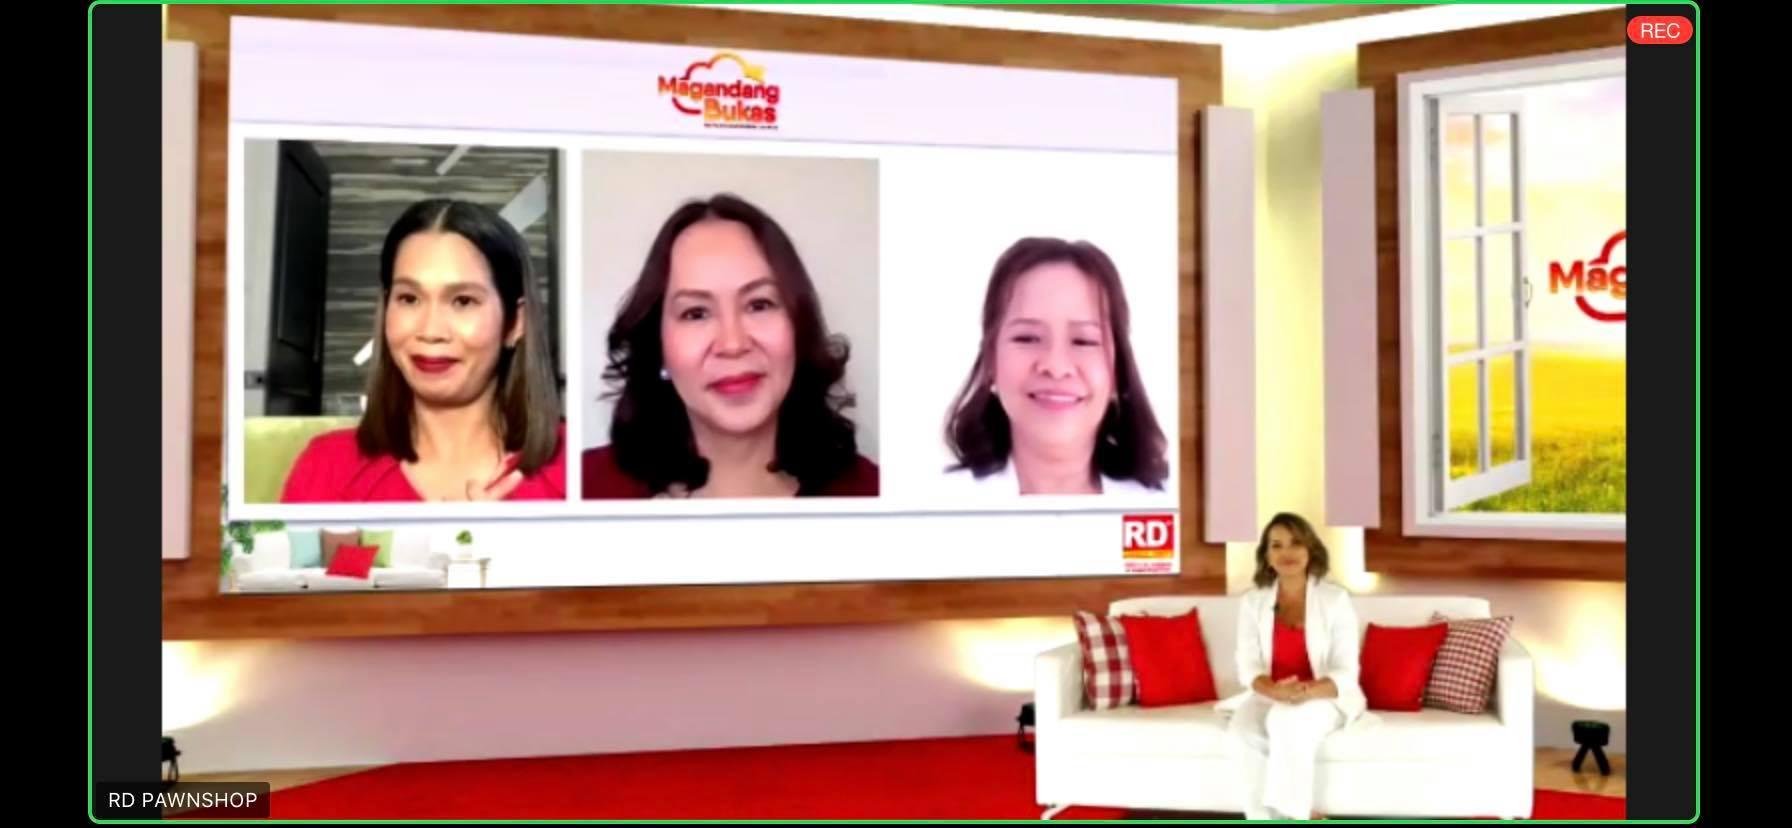 RD Pawnshop Magandang Bukas launch